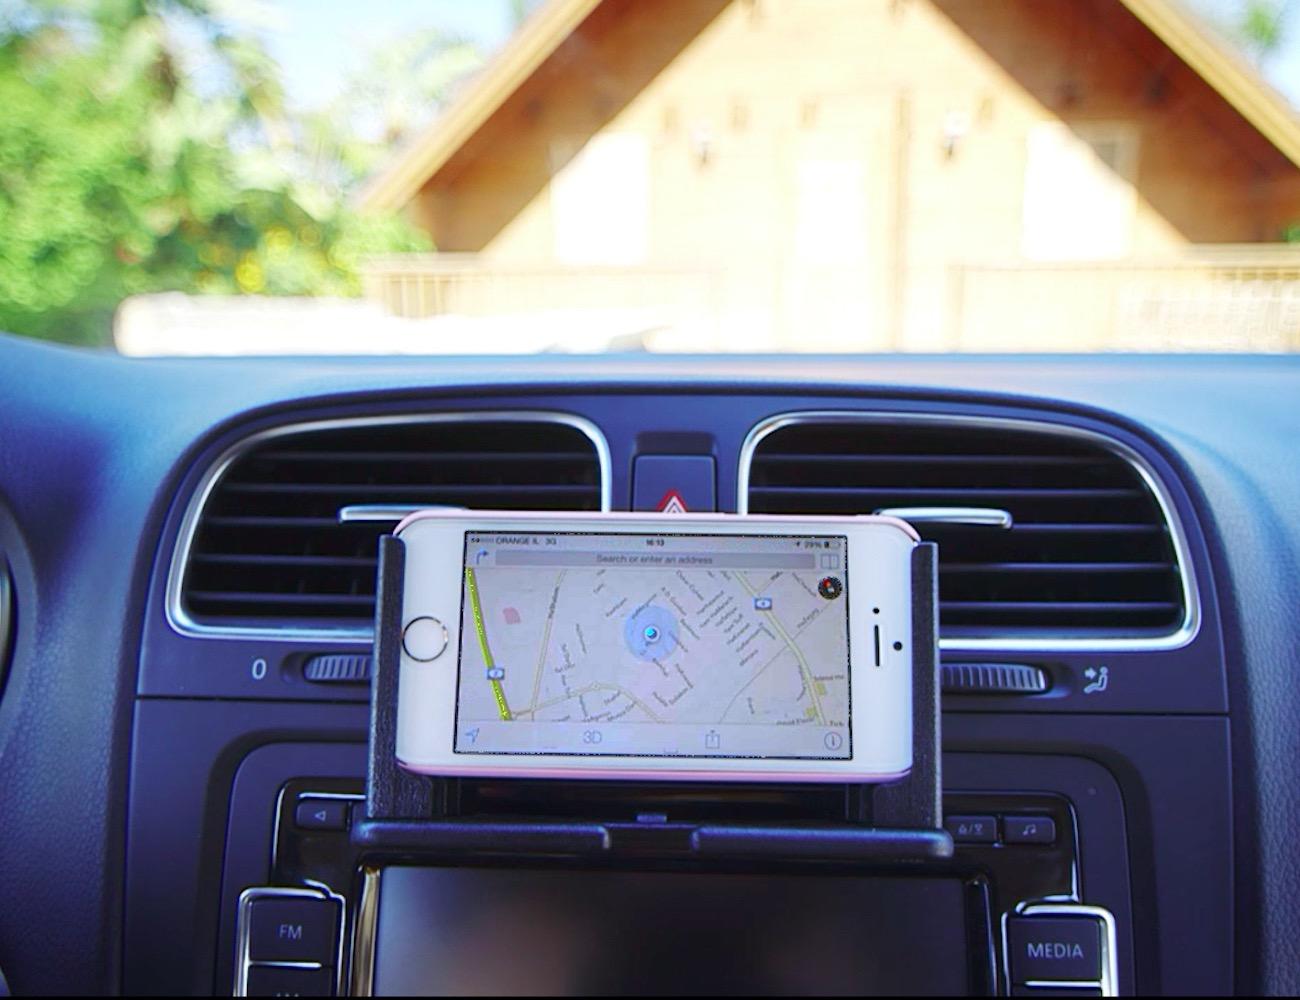 Radmo+Classic+Mobile+Car+Mount